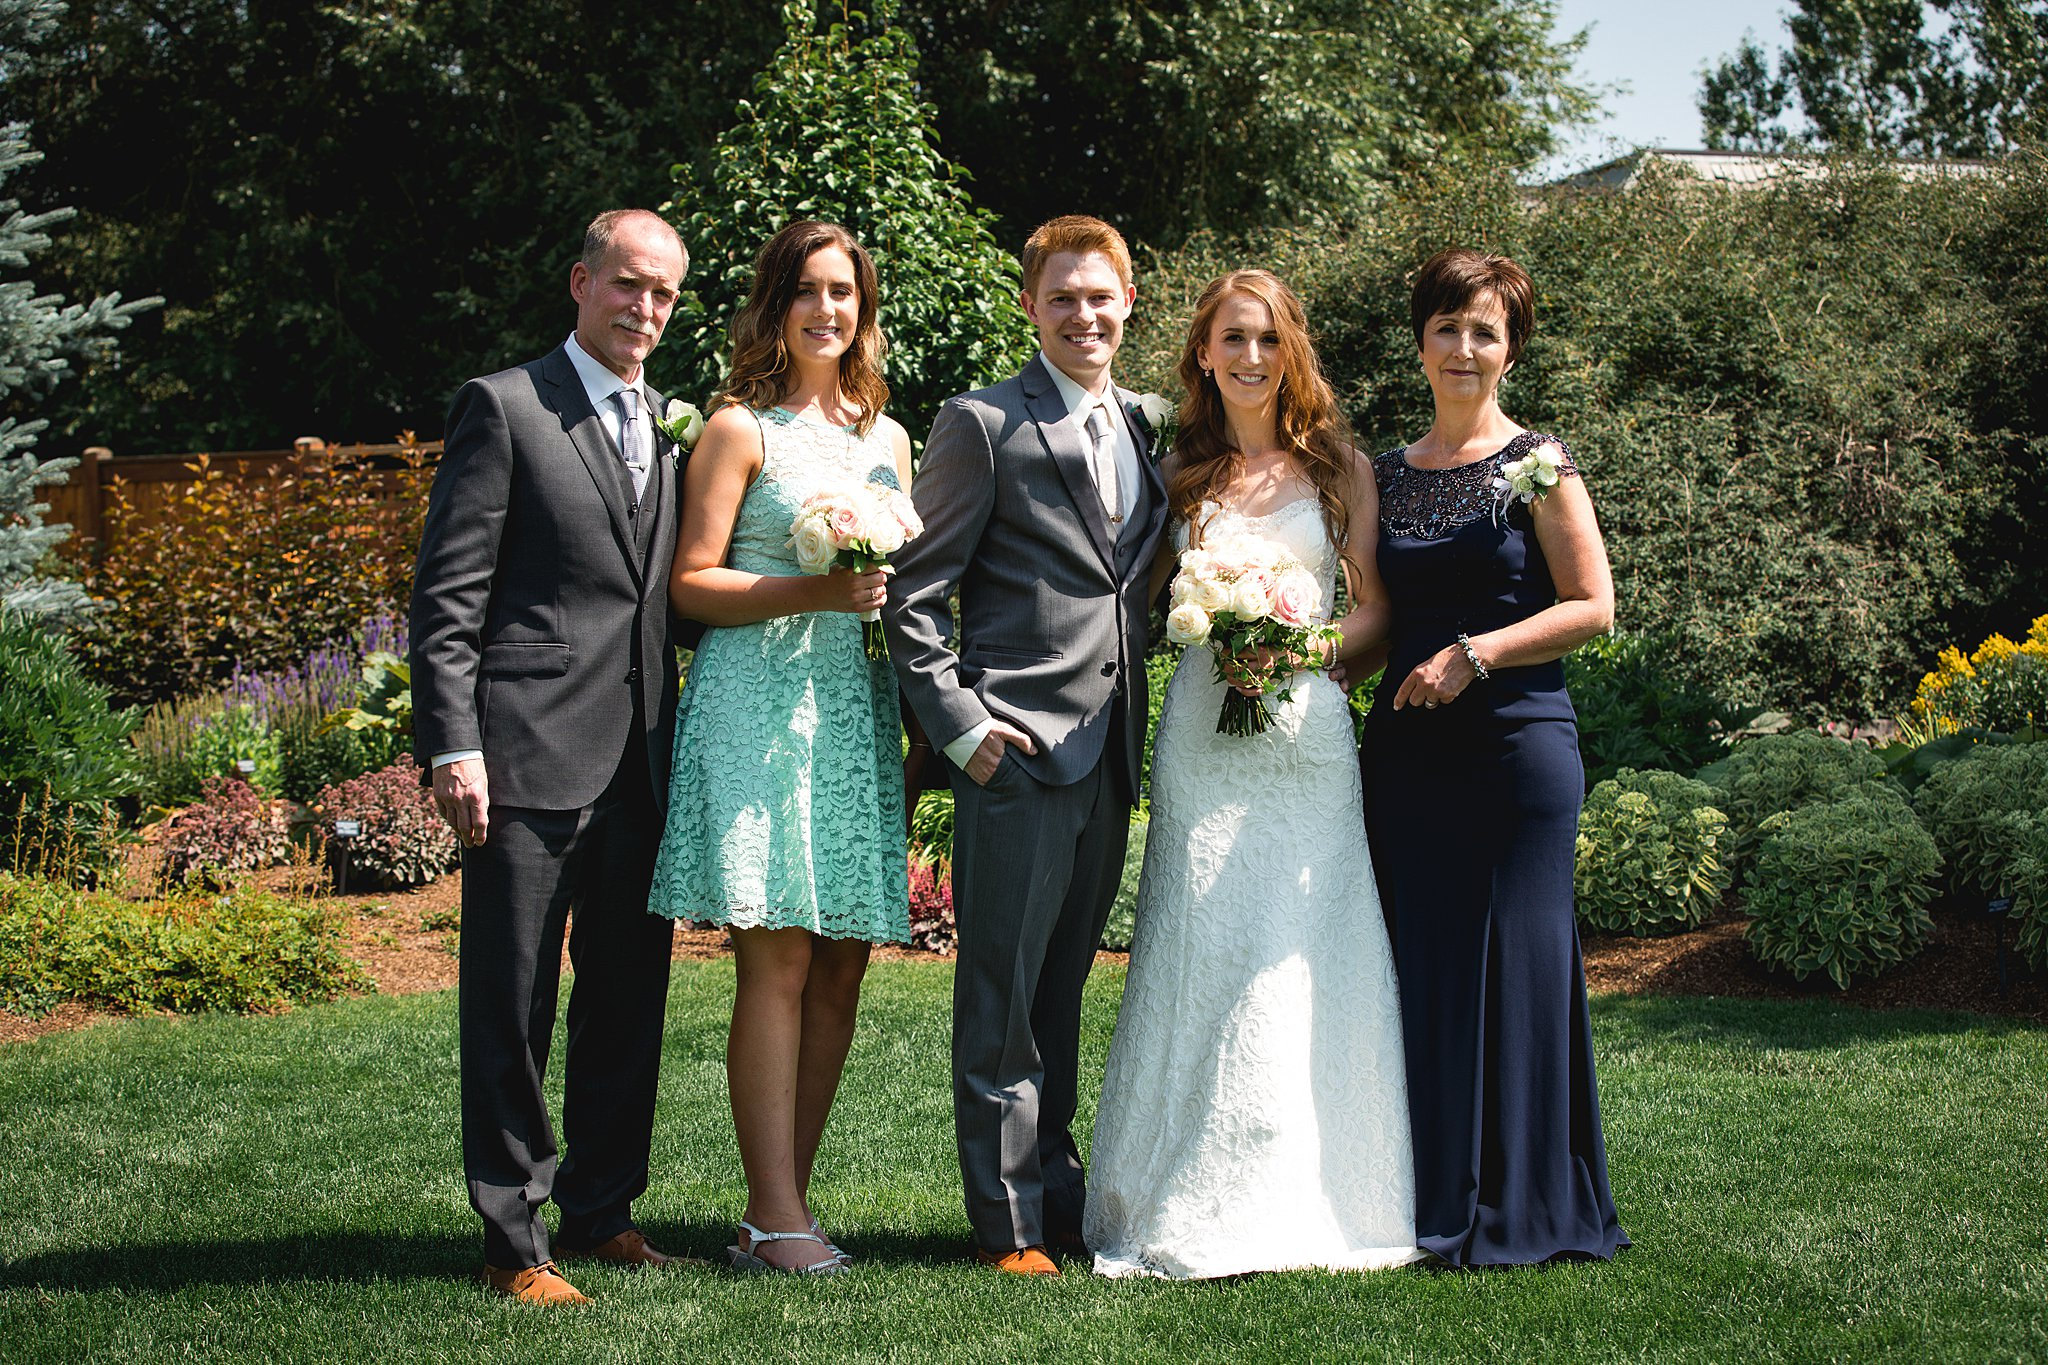 Ashley Daphne Photography Calgary Wedding Couple Family Photographer Calgary Zoo Summer Wedding Outdoor Ceremony_0100.jpg